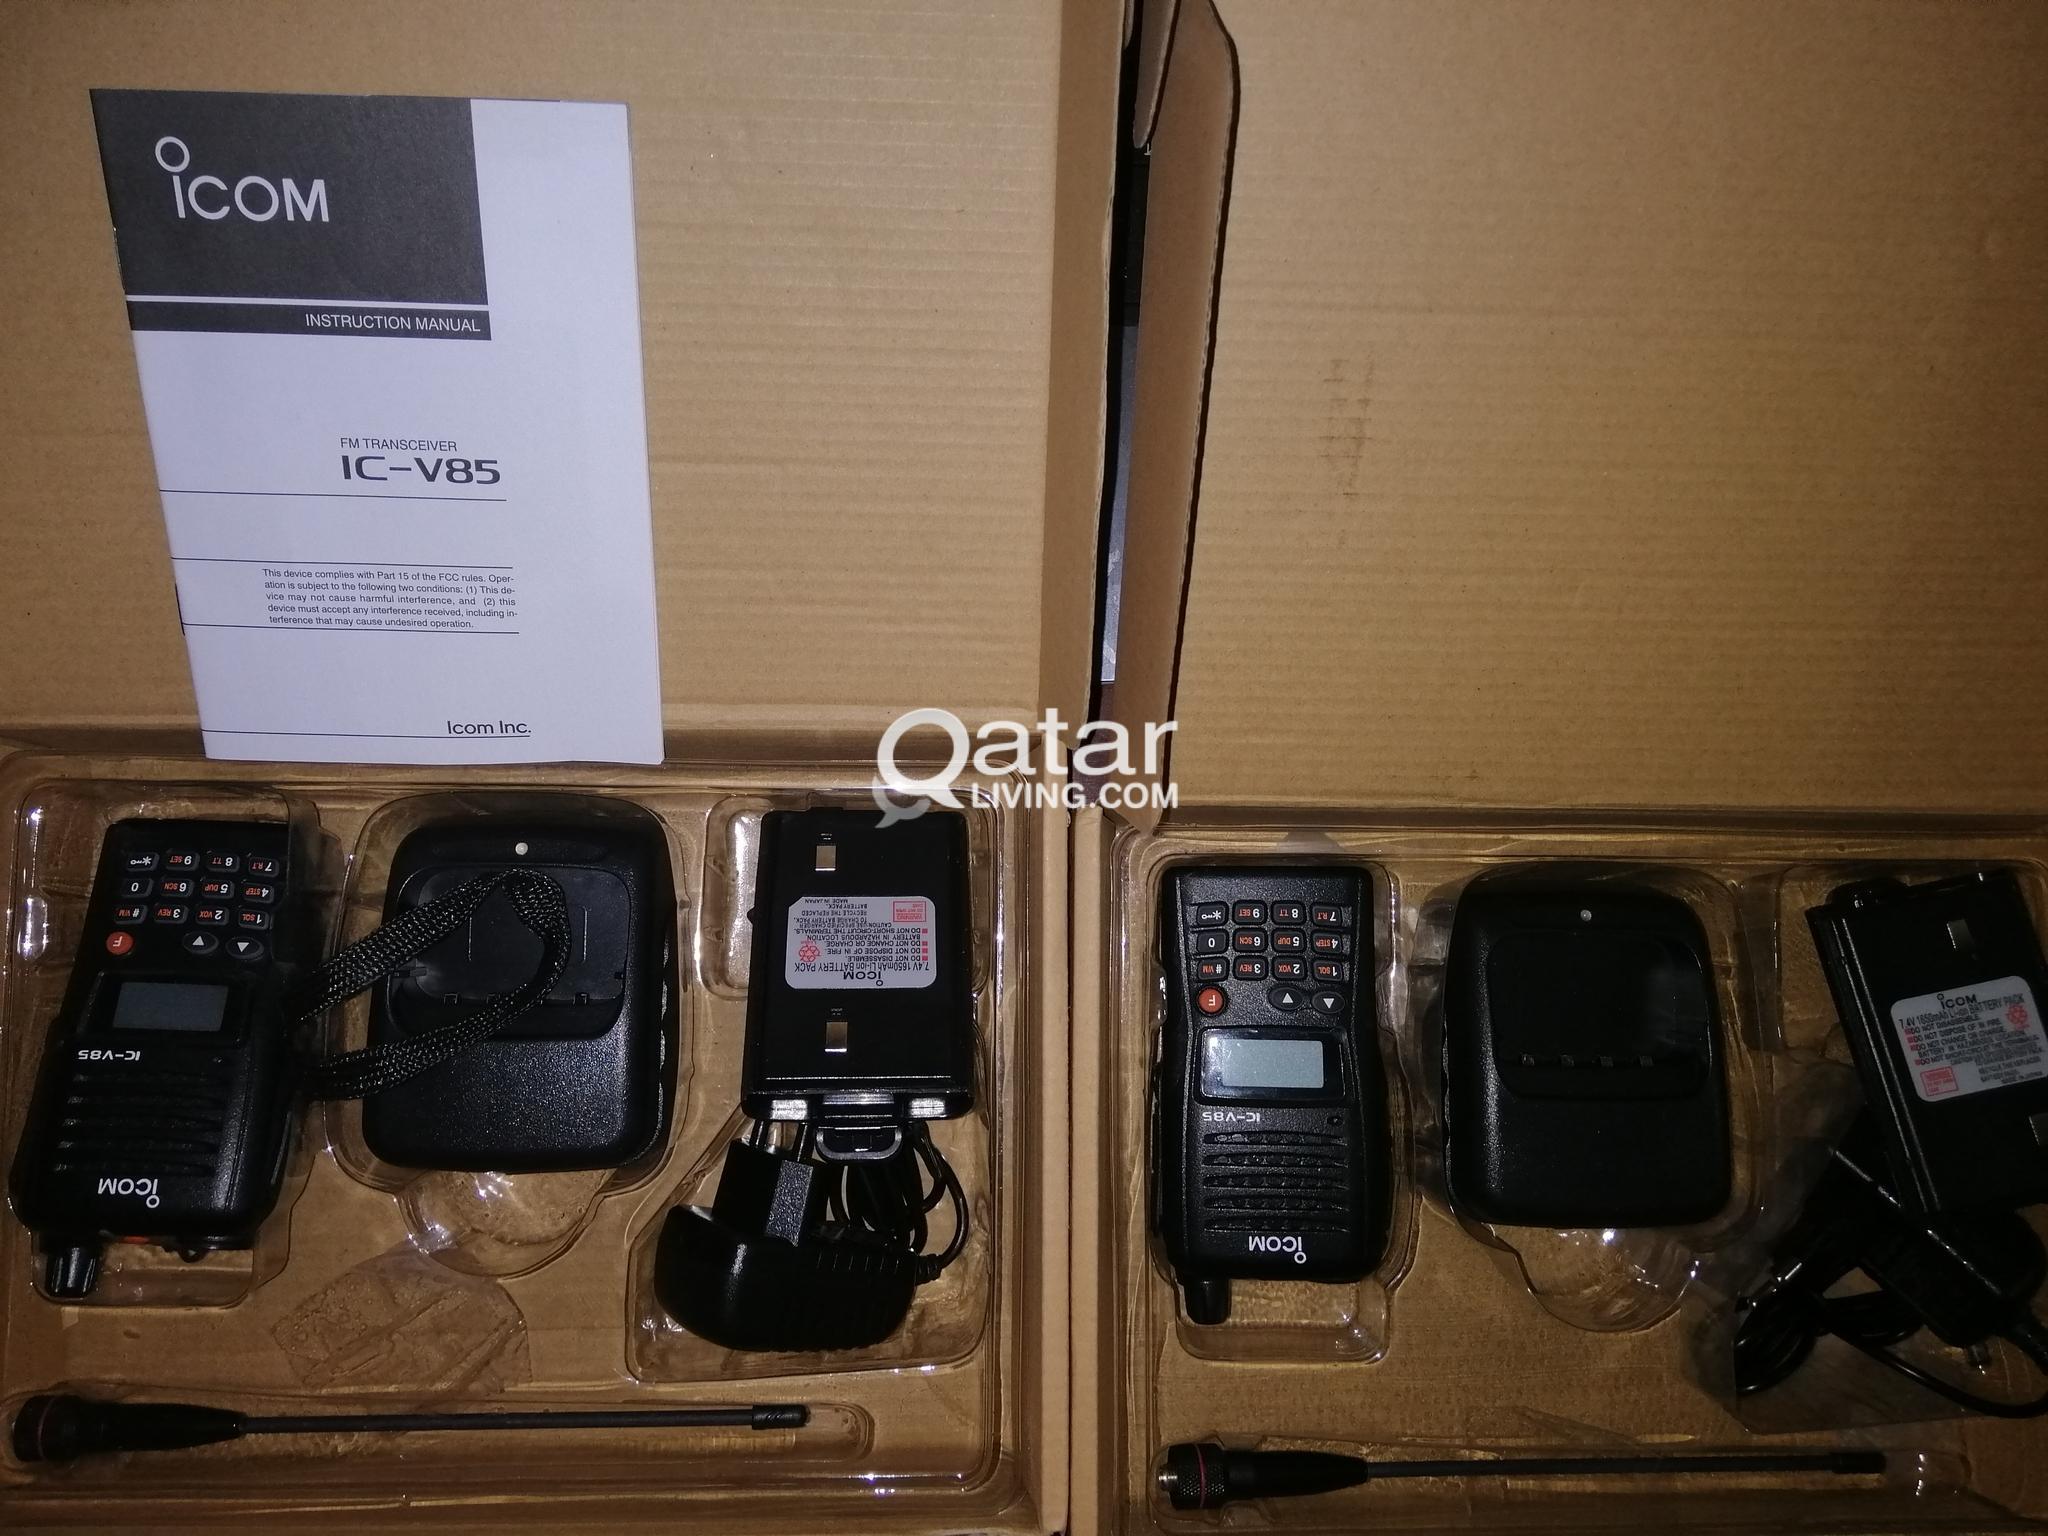 ICOM PTT Radio (Walkie Talkie)